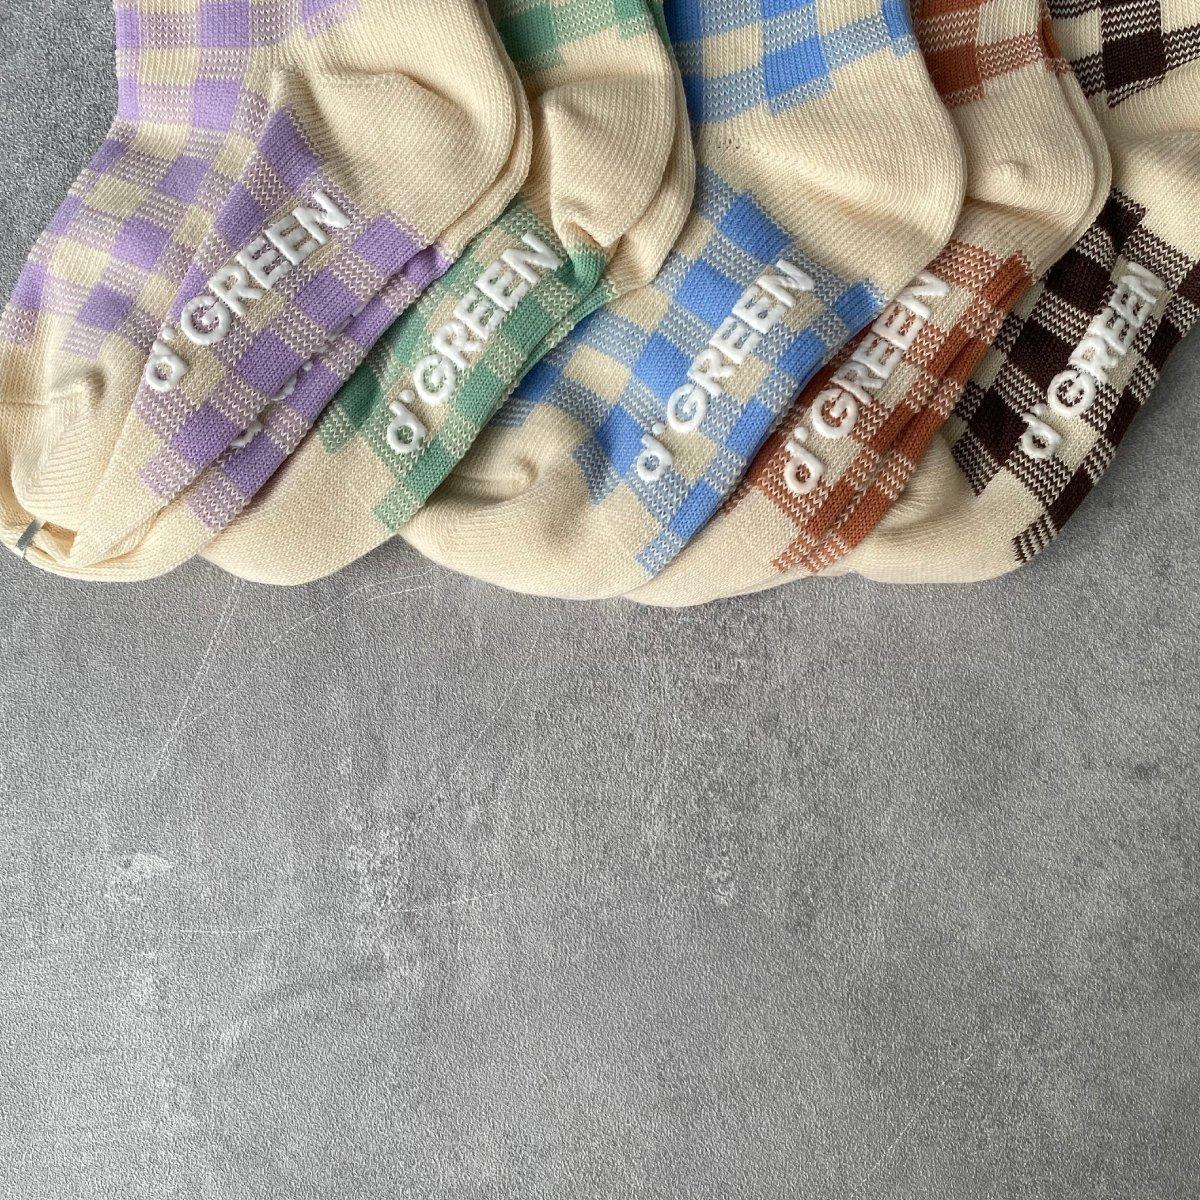 【KIDS】Natural Check Socks 詳細画像7